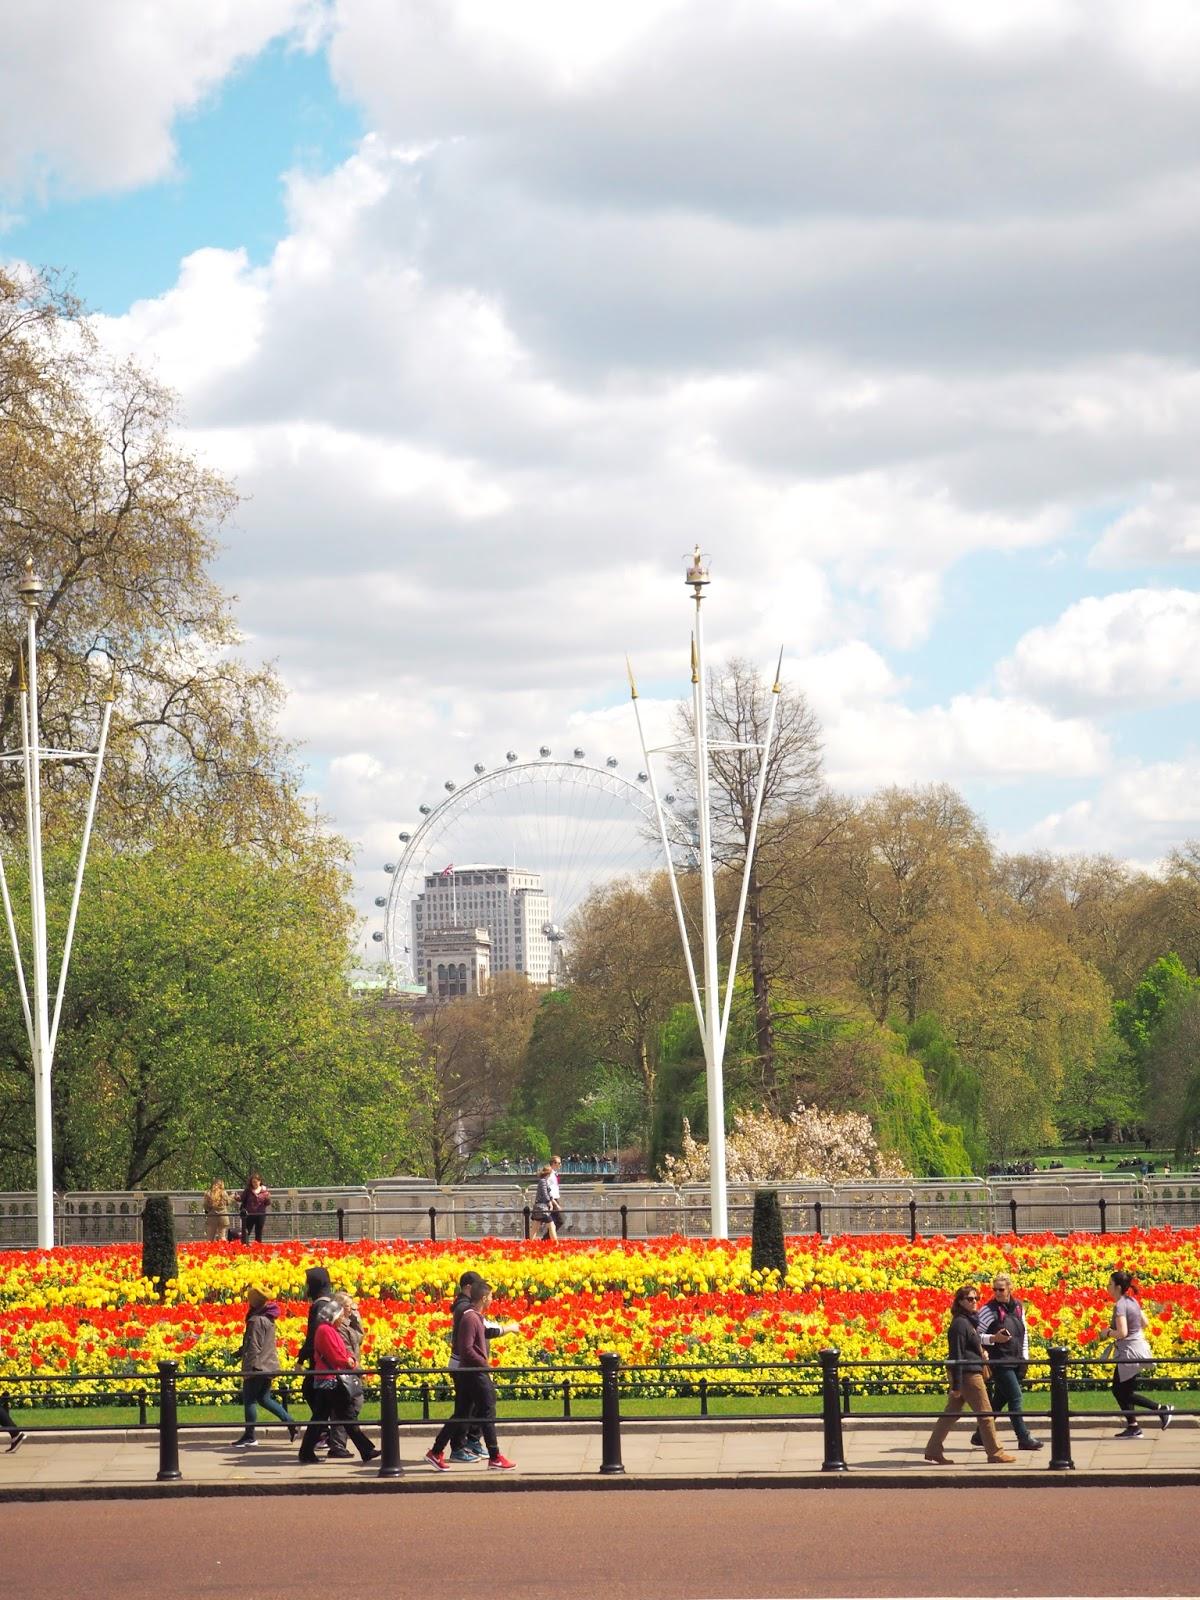 Postcards from London - London Eye